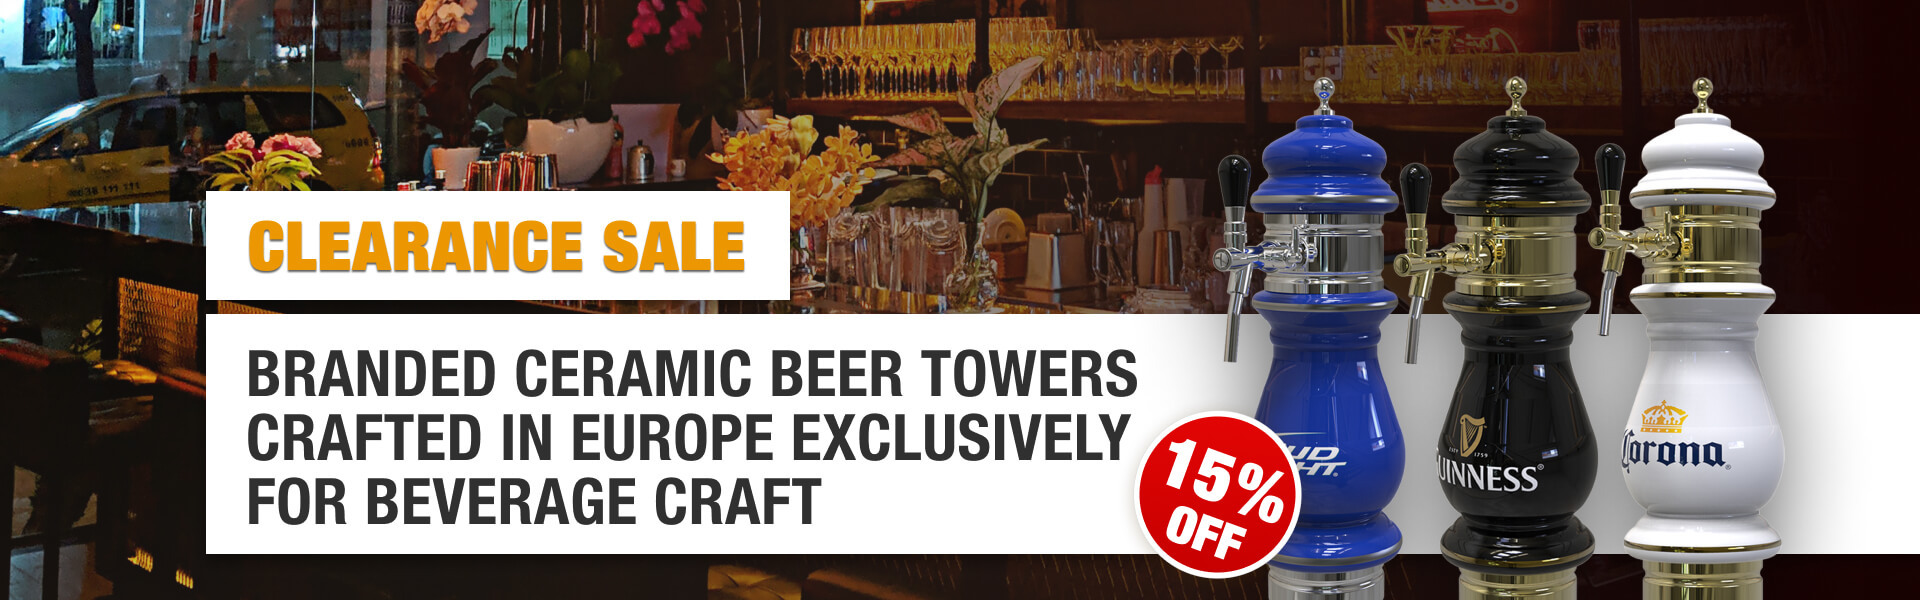 branded ceramic beer towers 15 off